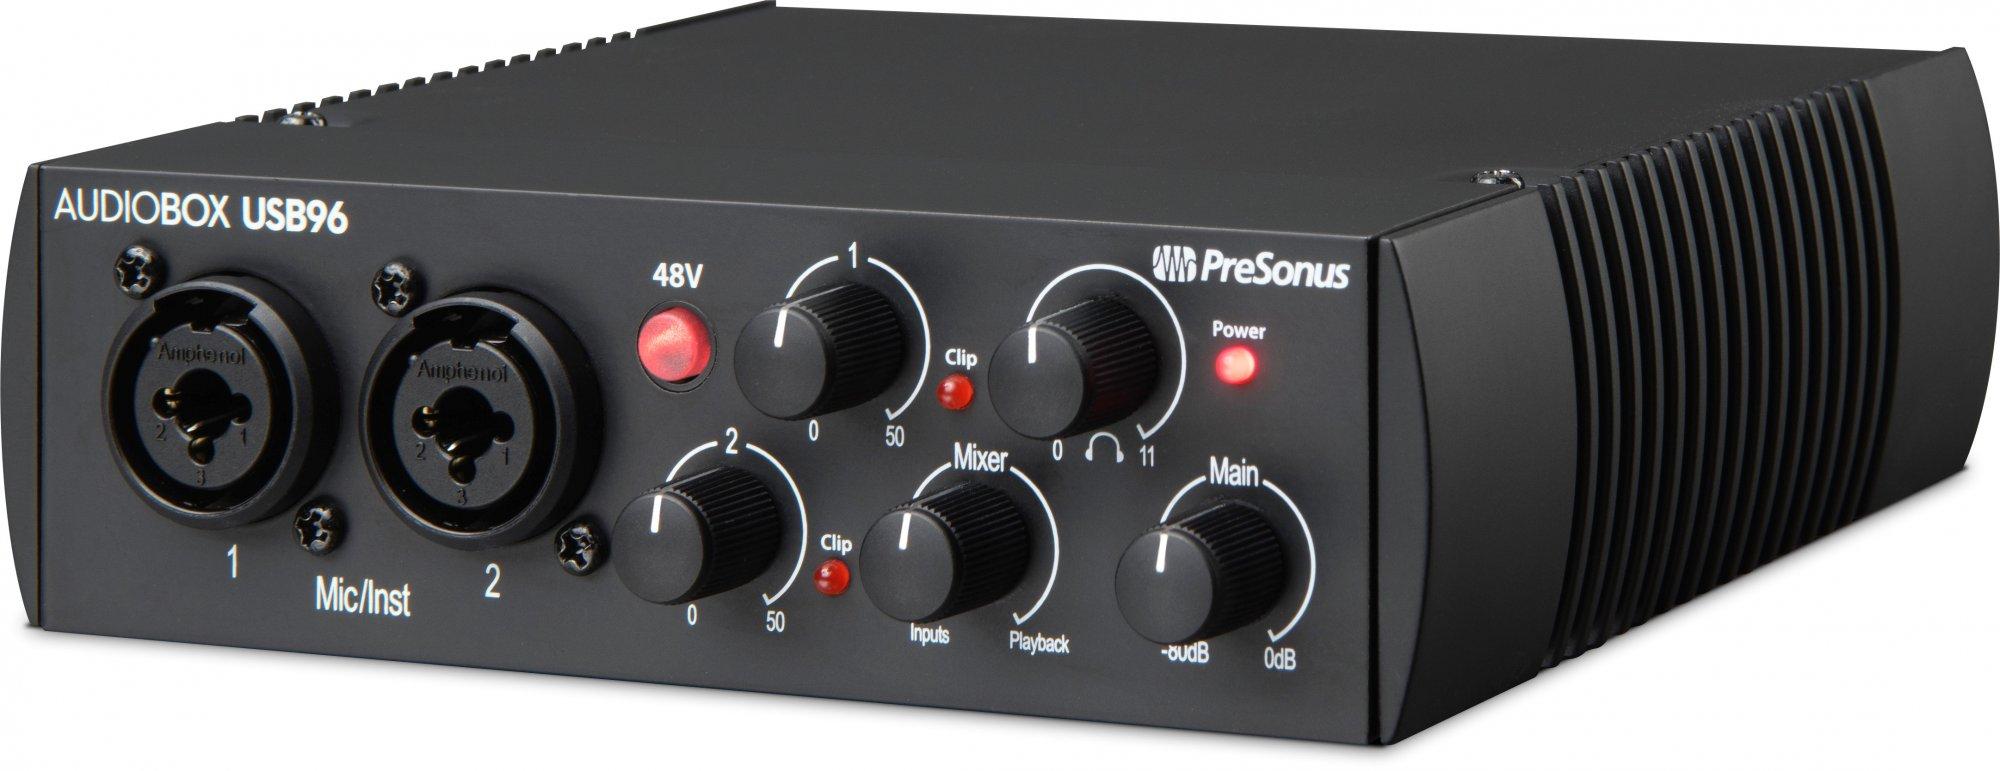 Presonus AudioBox USB96 25th Anniversary Edition: 2x2 USB 2.0 Audio Interface